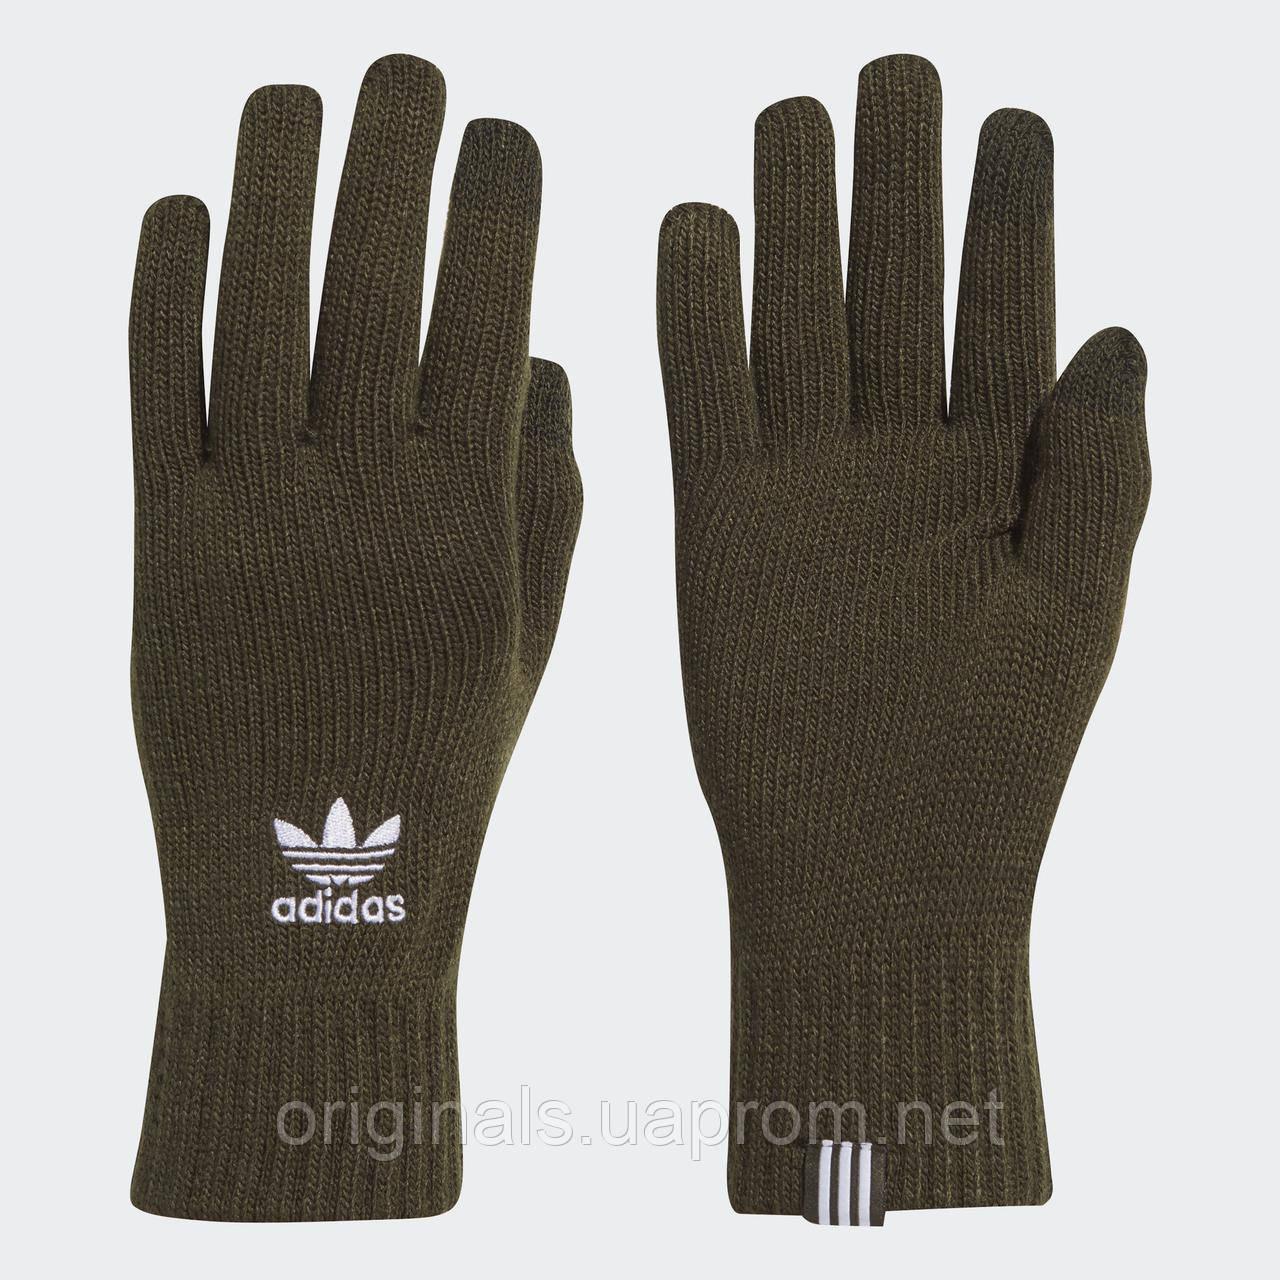 Перчатки Adidas Originals Smartphone Gloves DH3359